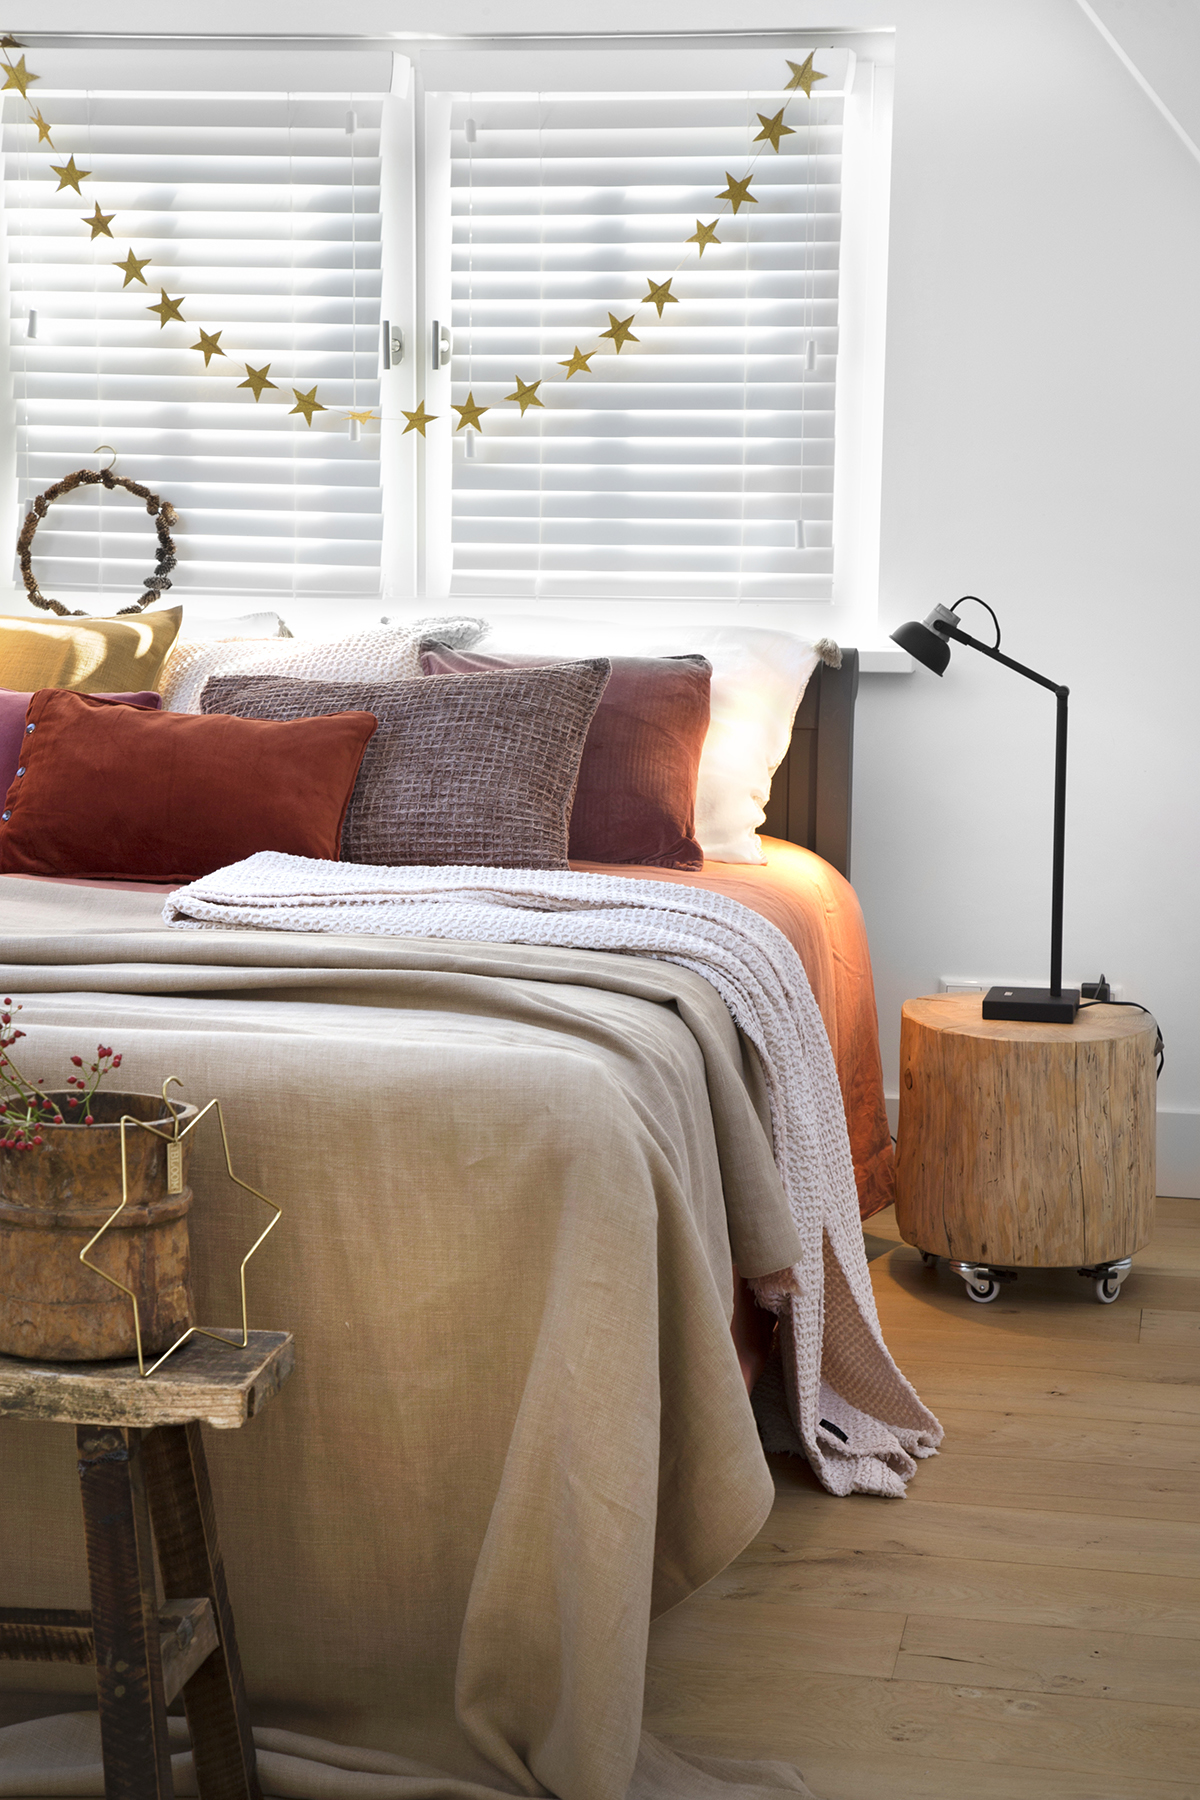 goud kerst slinger slaapkamer